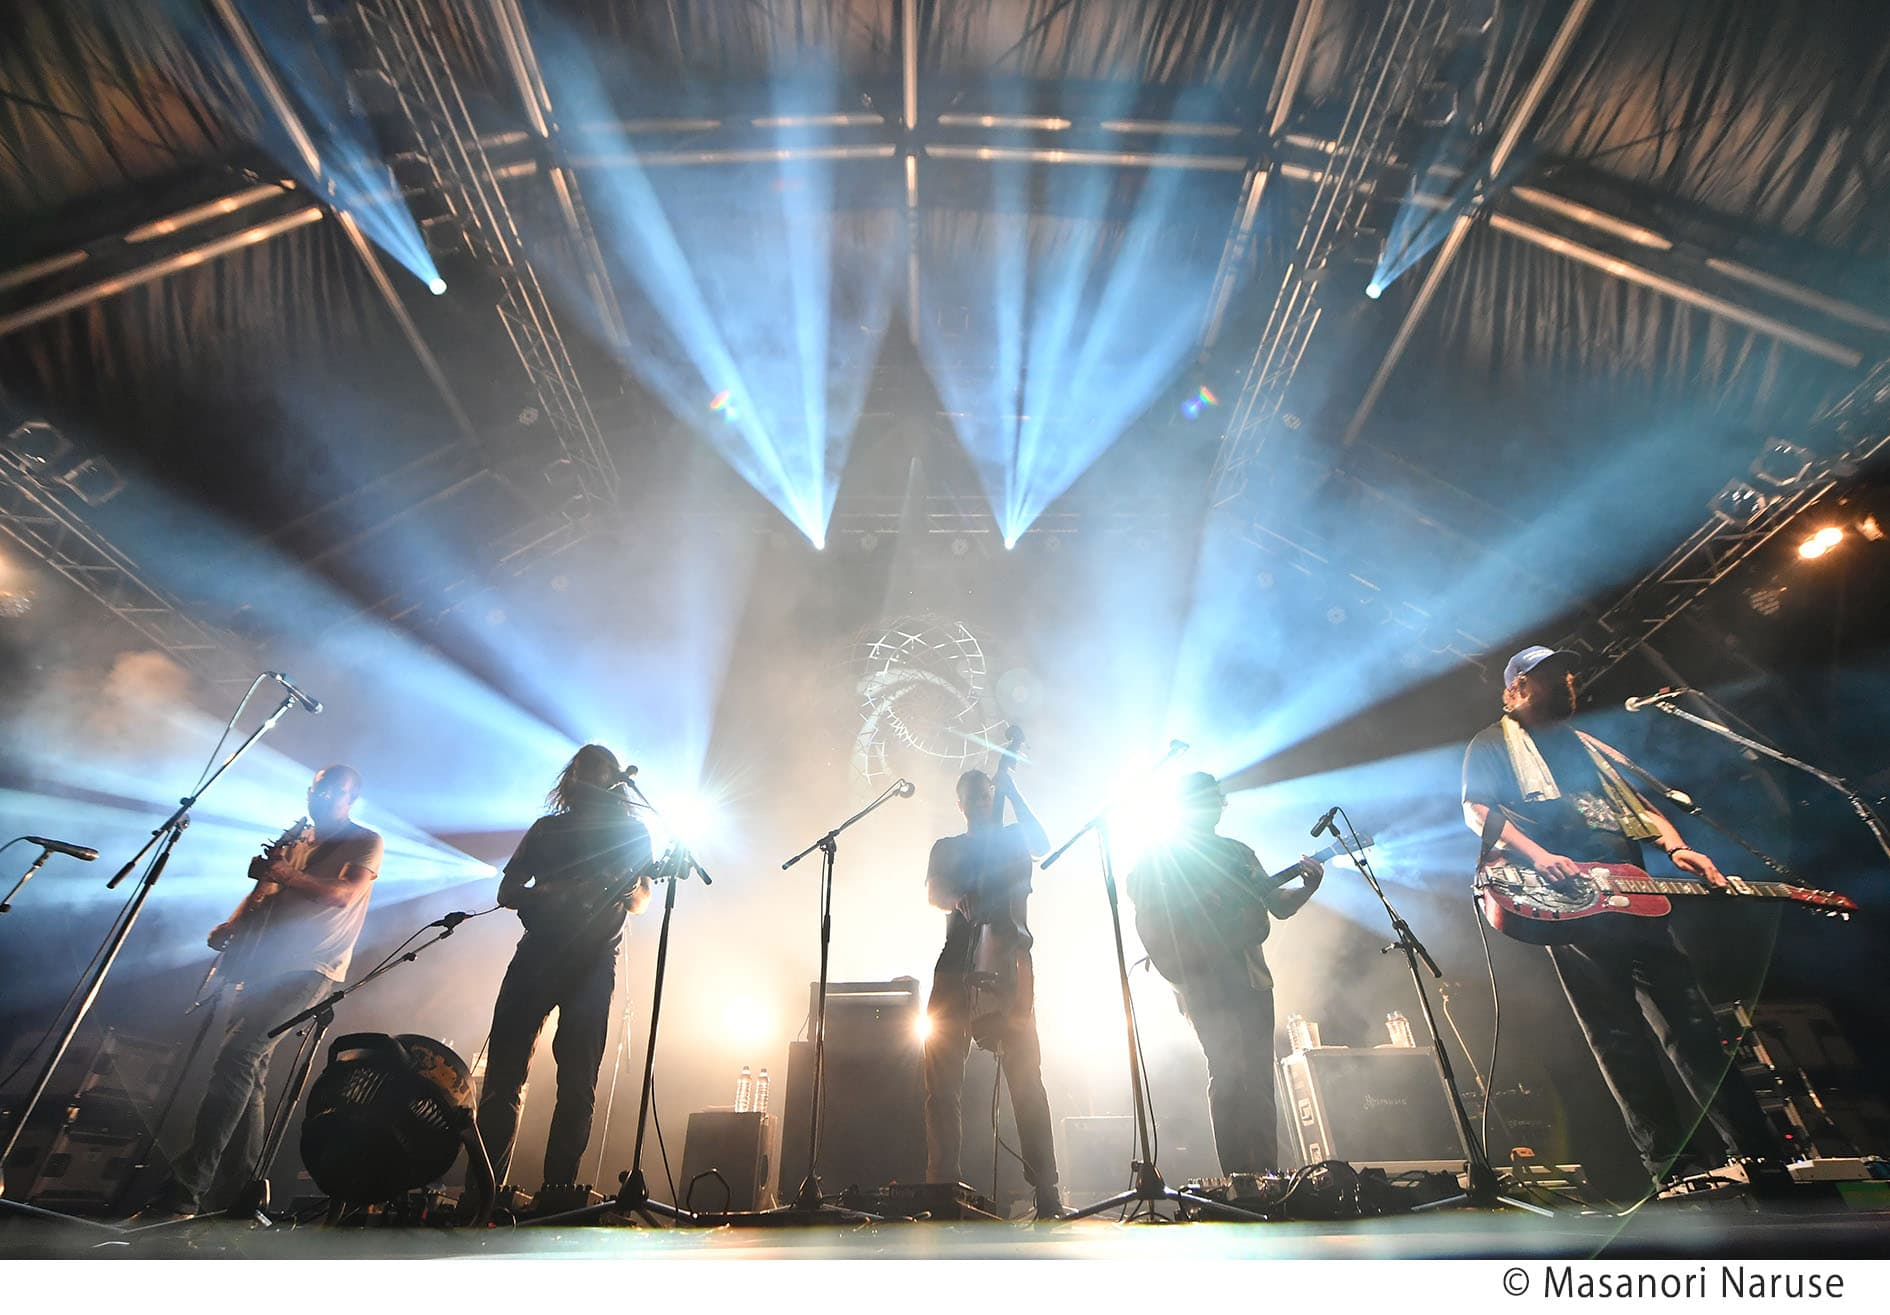 【FUJI ROCK FESTIVAL'18】ヘブンのトリを務めた全米屈指のライヴ・バンド、グリーンスカイ・ブルーグラス独占インタビュー